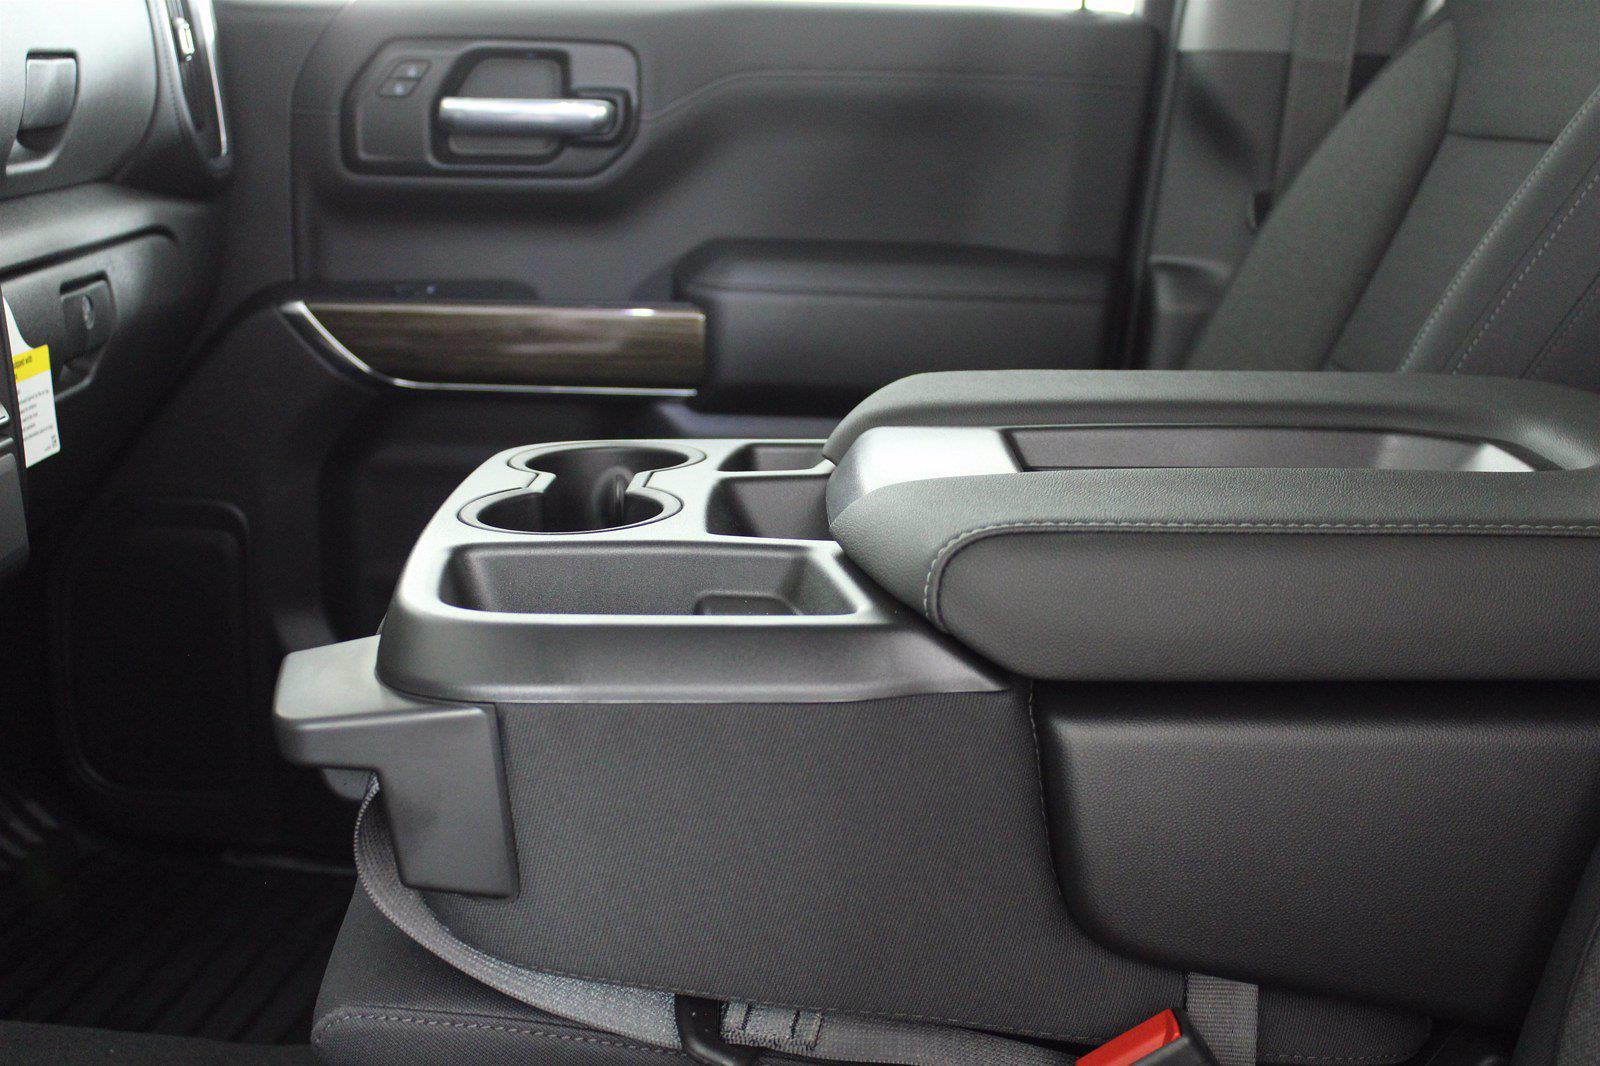 2021 Chevrolet Silverado 1500 Crew Cab 4x4, Pickup #D111136 - photo 13